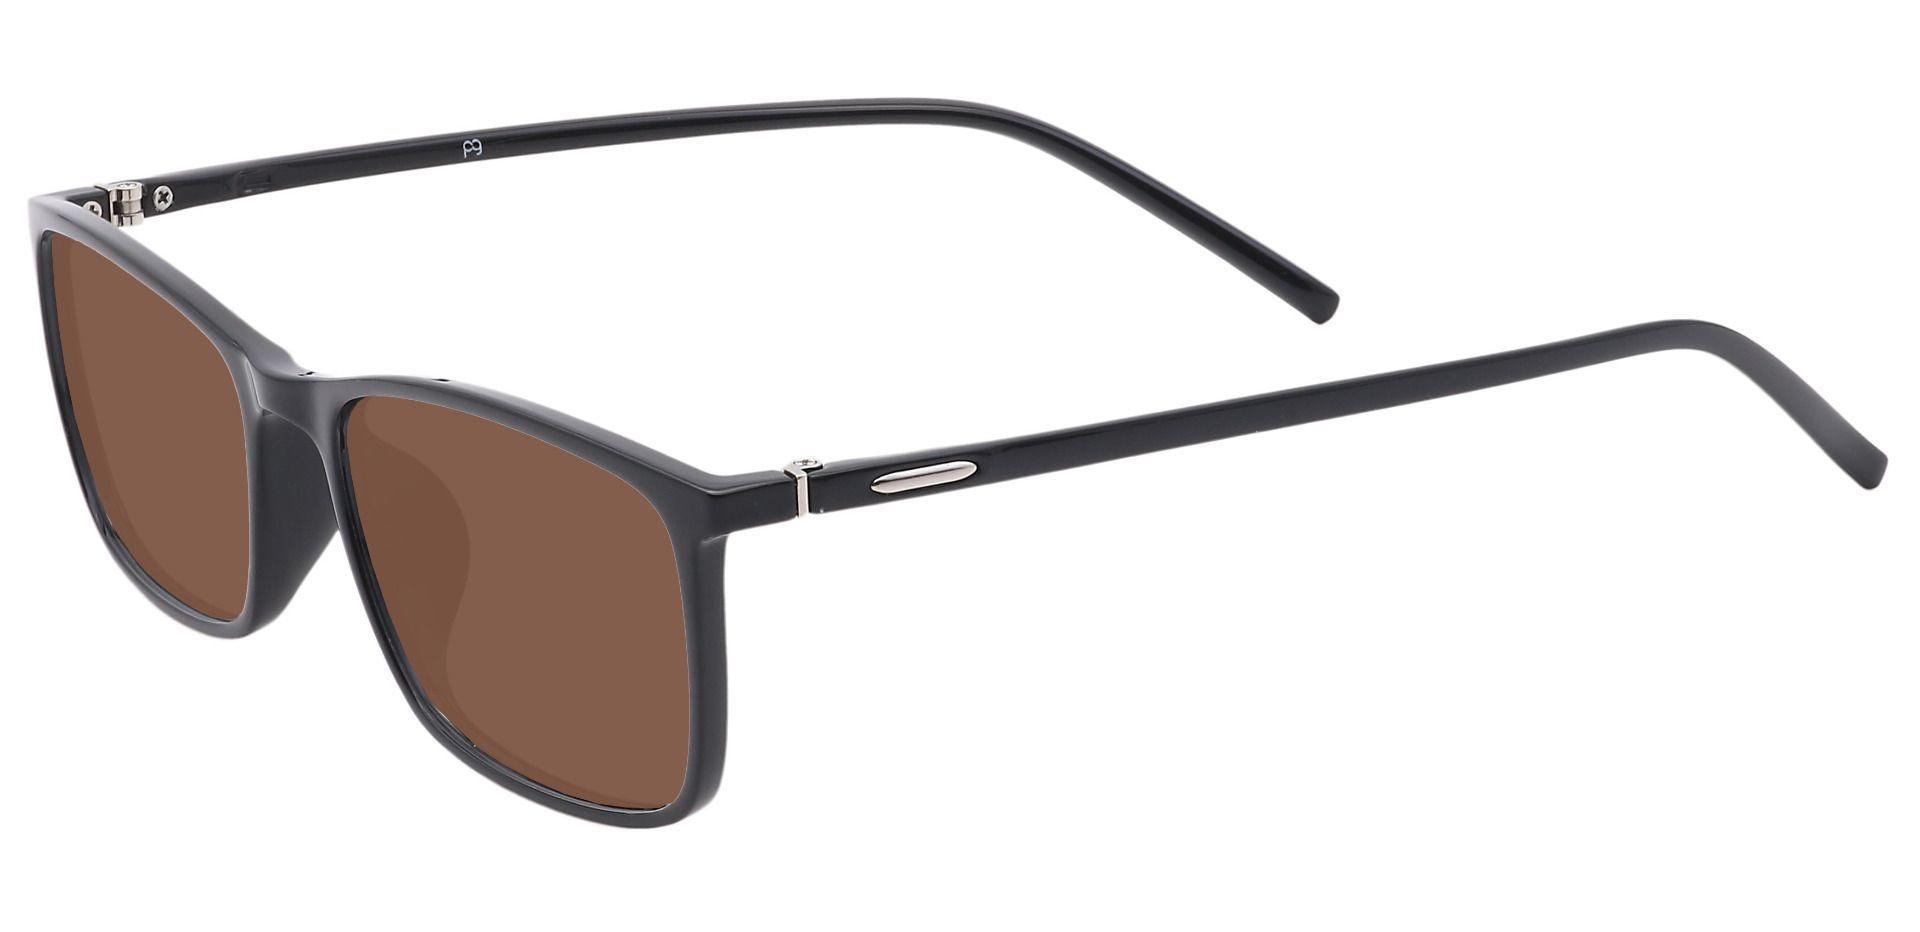 Fuji Rectangle Progressive Sunglasses - Black Frame With Brown Lenses